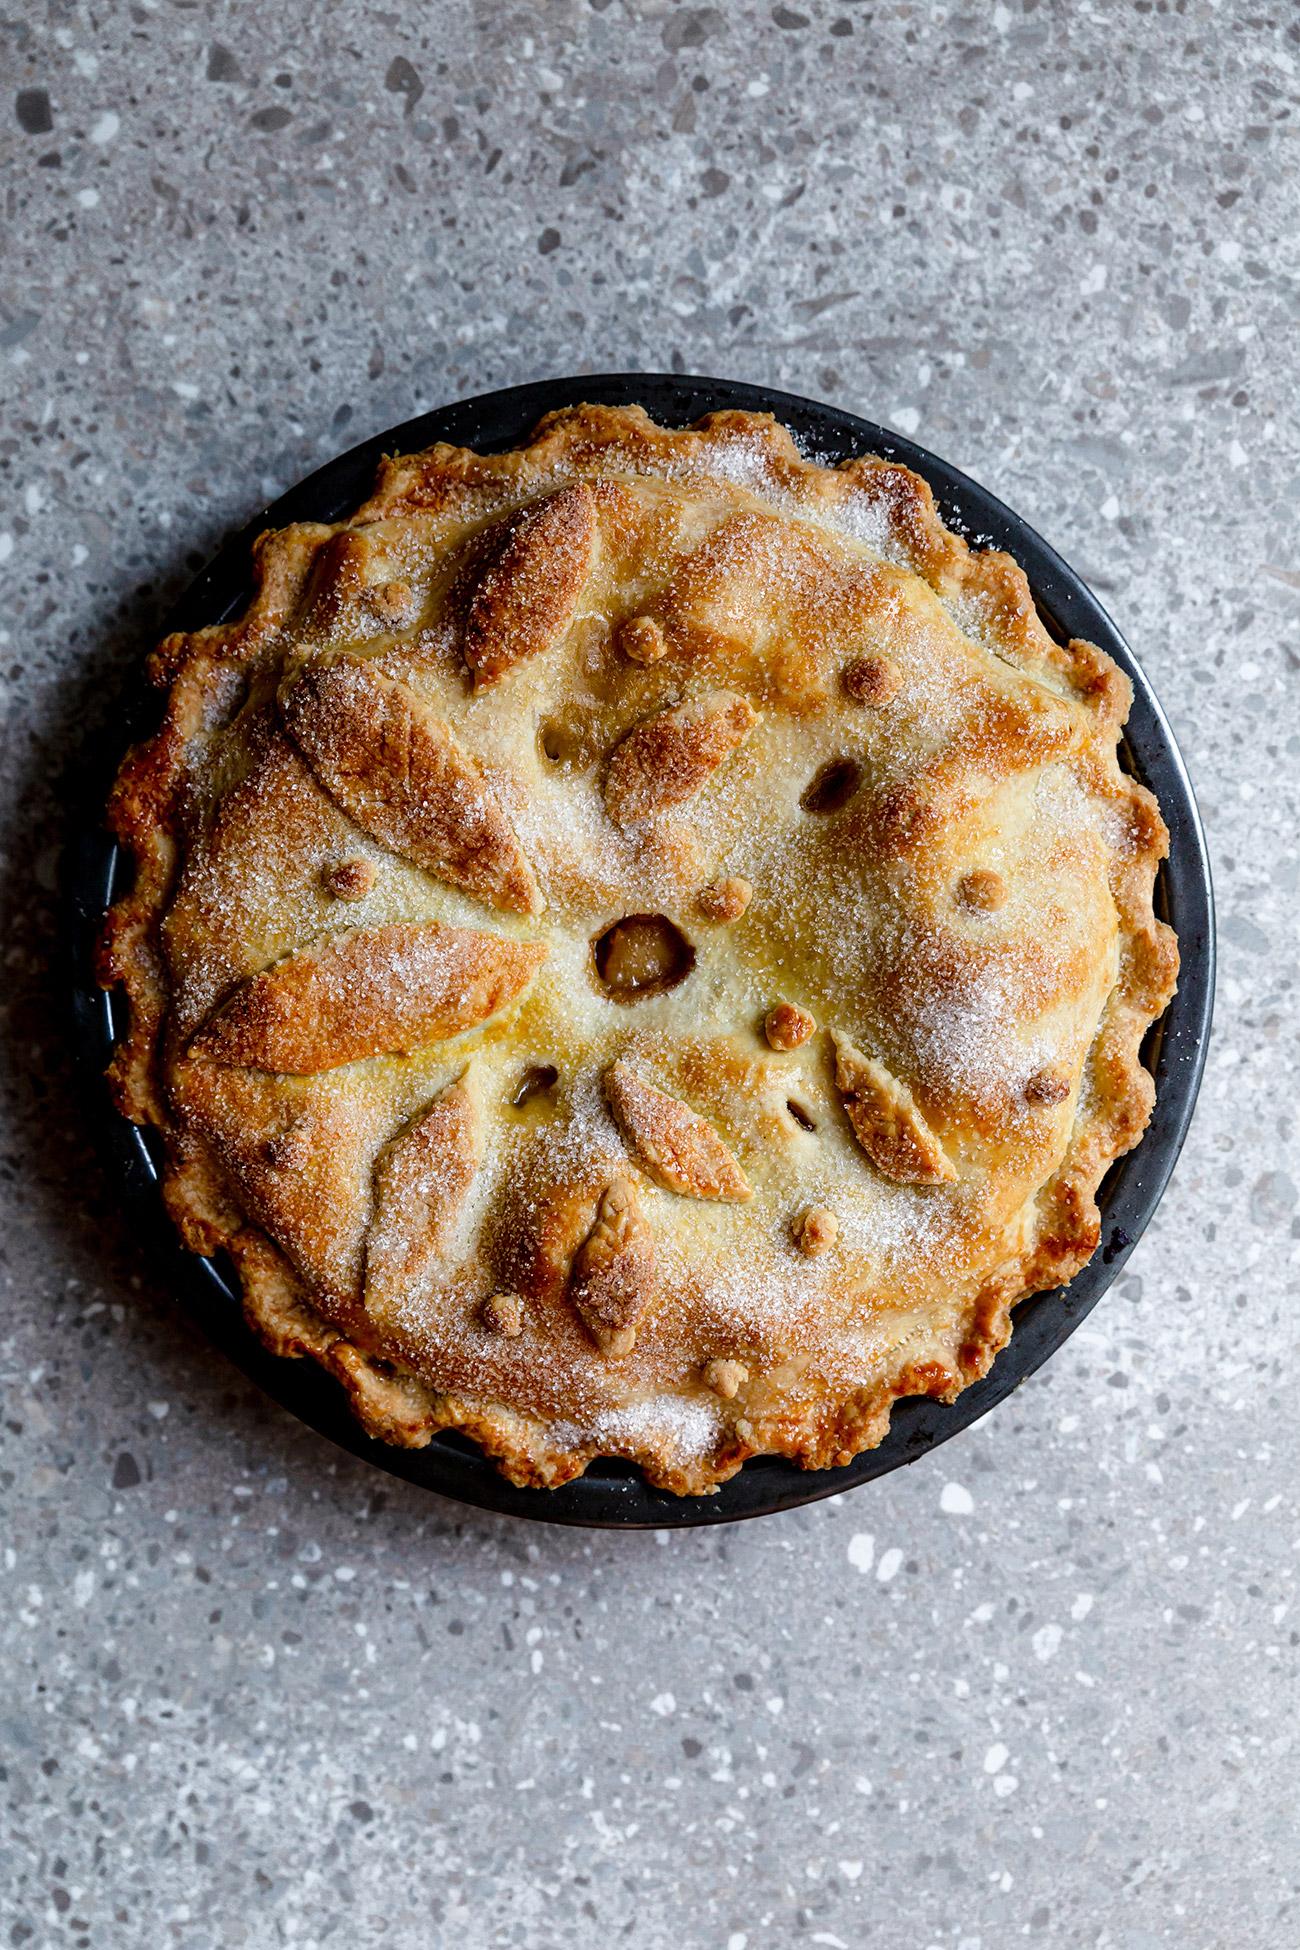 Recette De Tarte Au Sucre De Grand Mere : recette, tarte, sucre, grand, Tarte, Pommes, Mère-Grand, Christelle, Flabbergasting